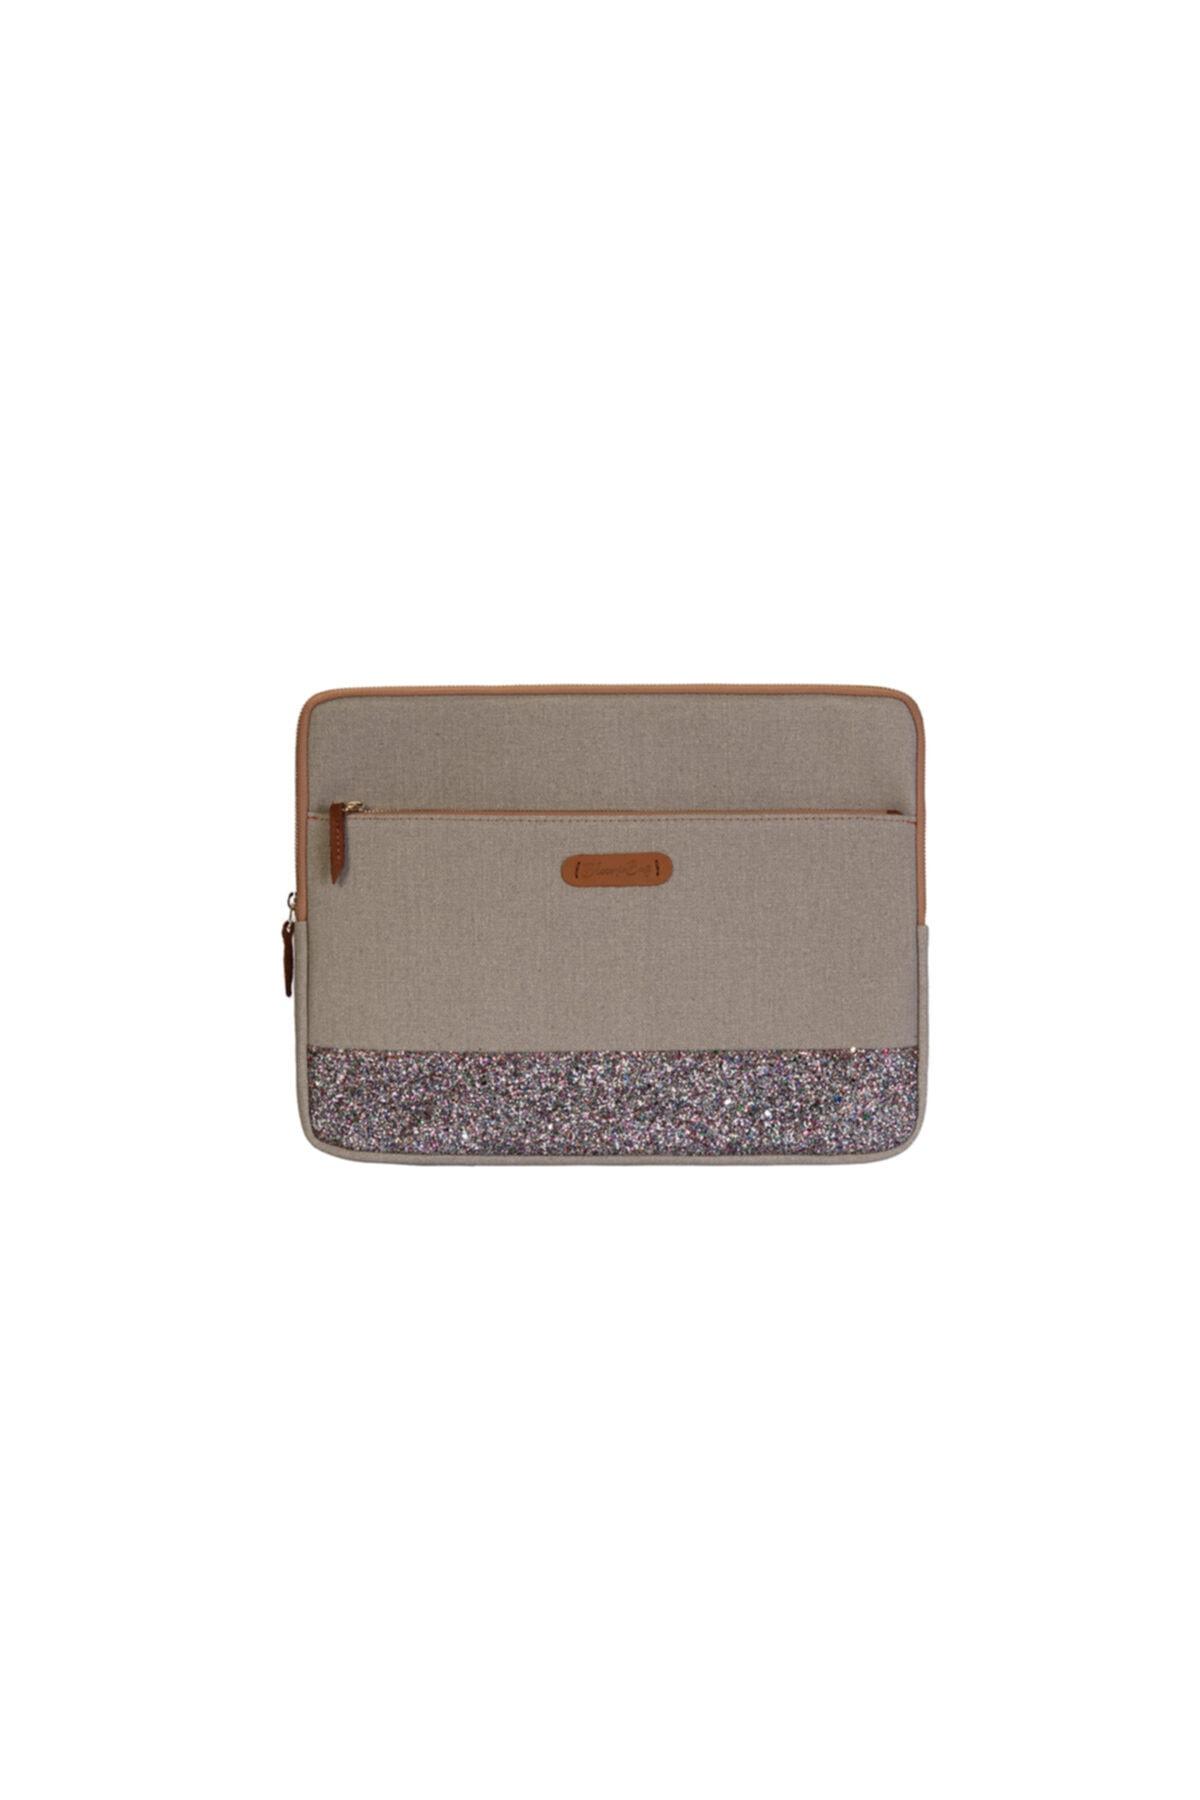 BloominBag Greenish Glitter 15 - 16 Inch Macbook - Laptop Kılıfı 1